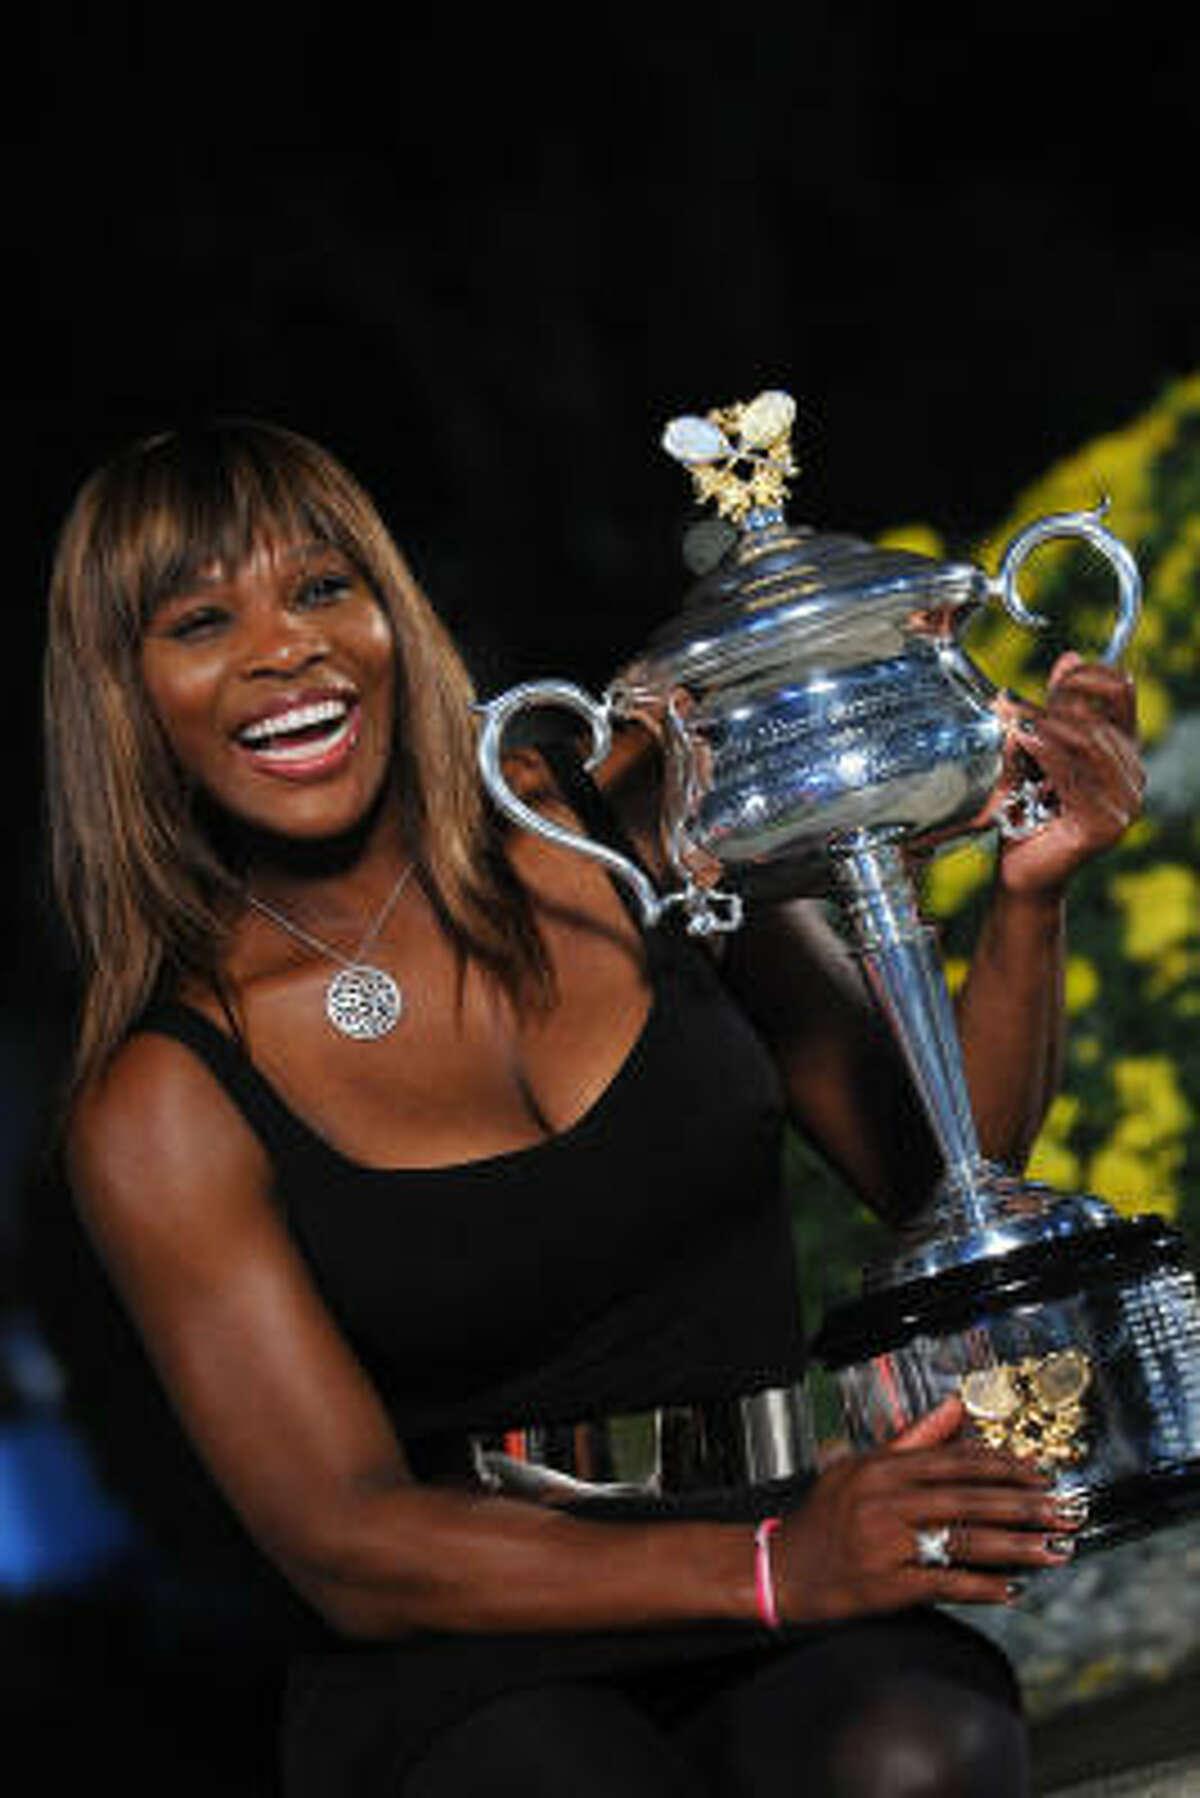 Tennis star Serena Williams: